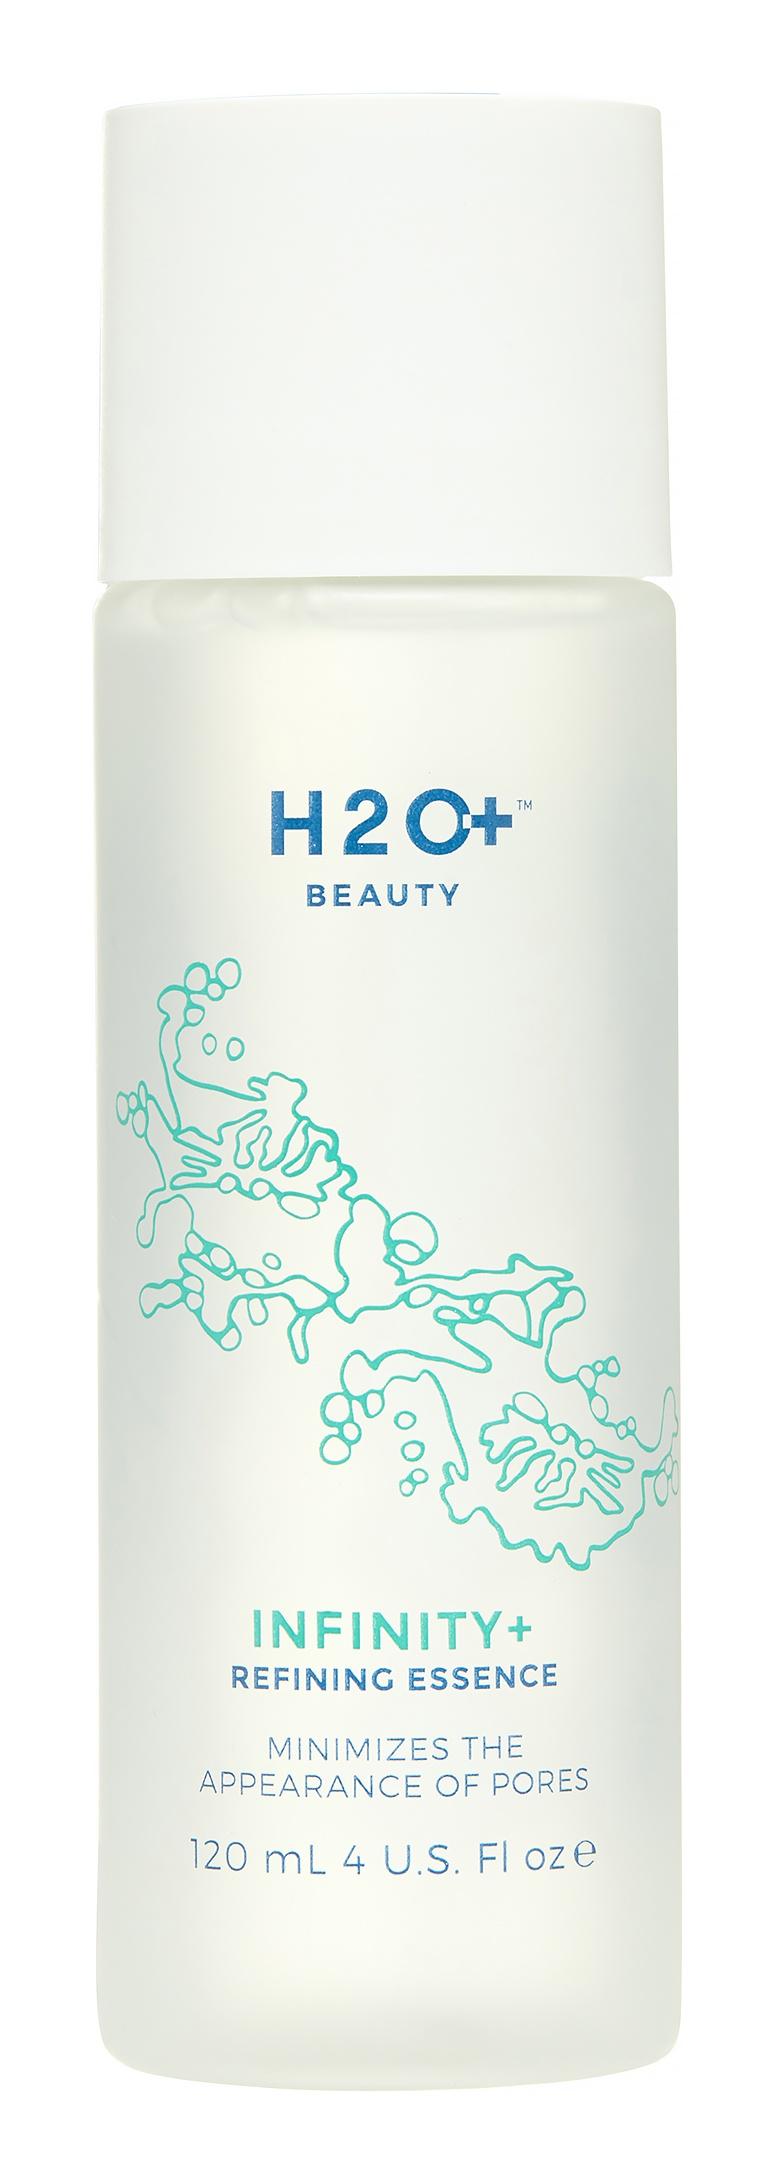 H2O+ Infinity+ Refining Essence